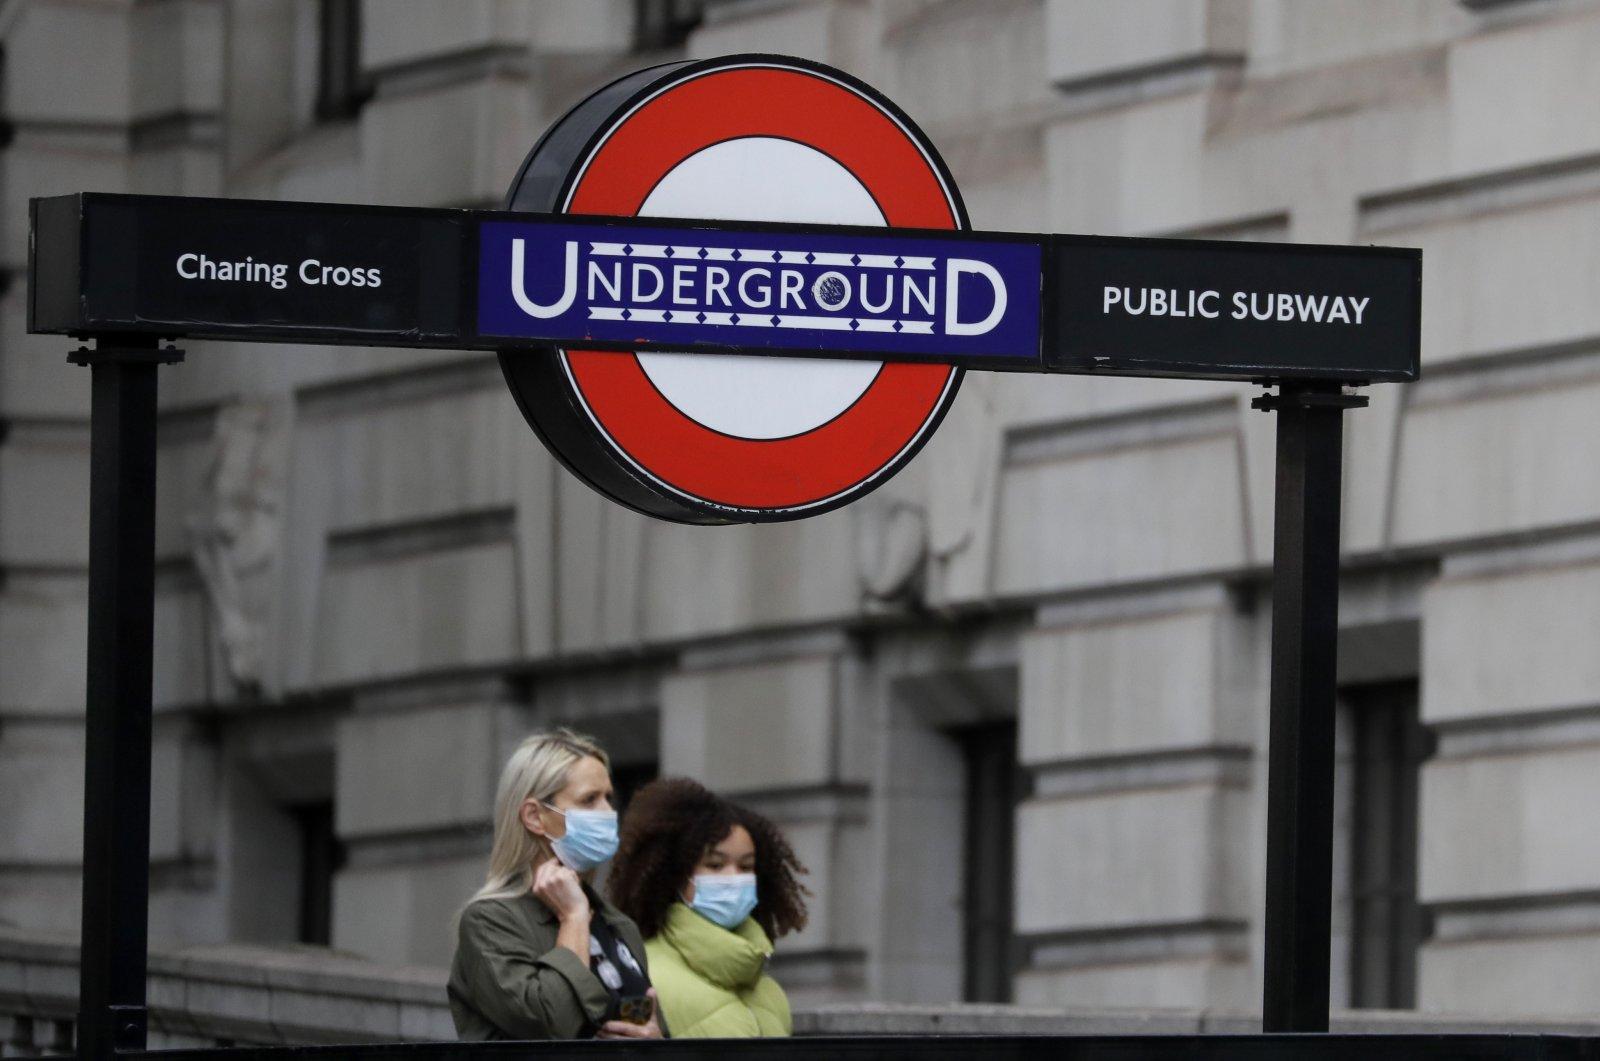 Pedestrians wear masks as they walk near Charing Cross Station in London, England, June 5, 2020. (AP Photo)